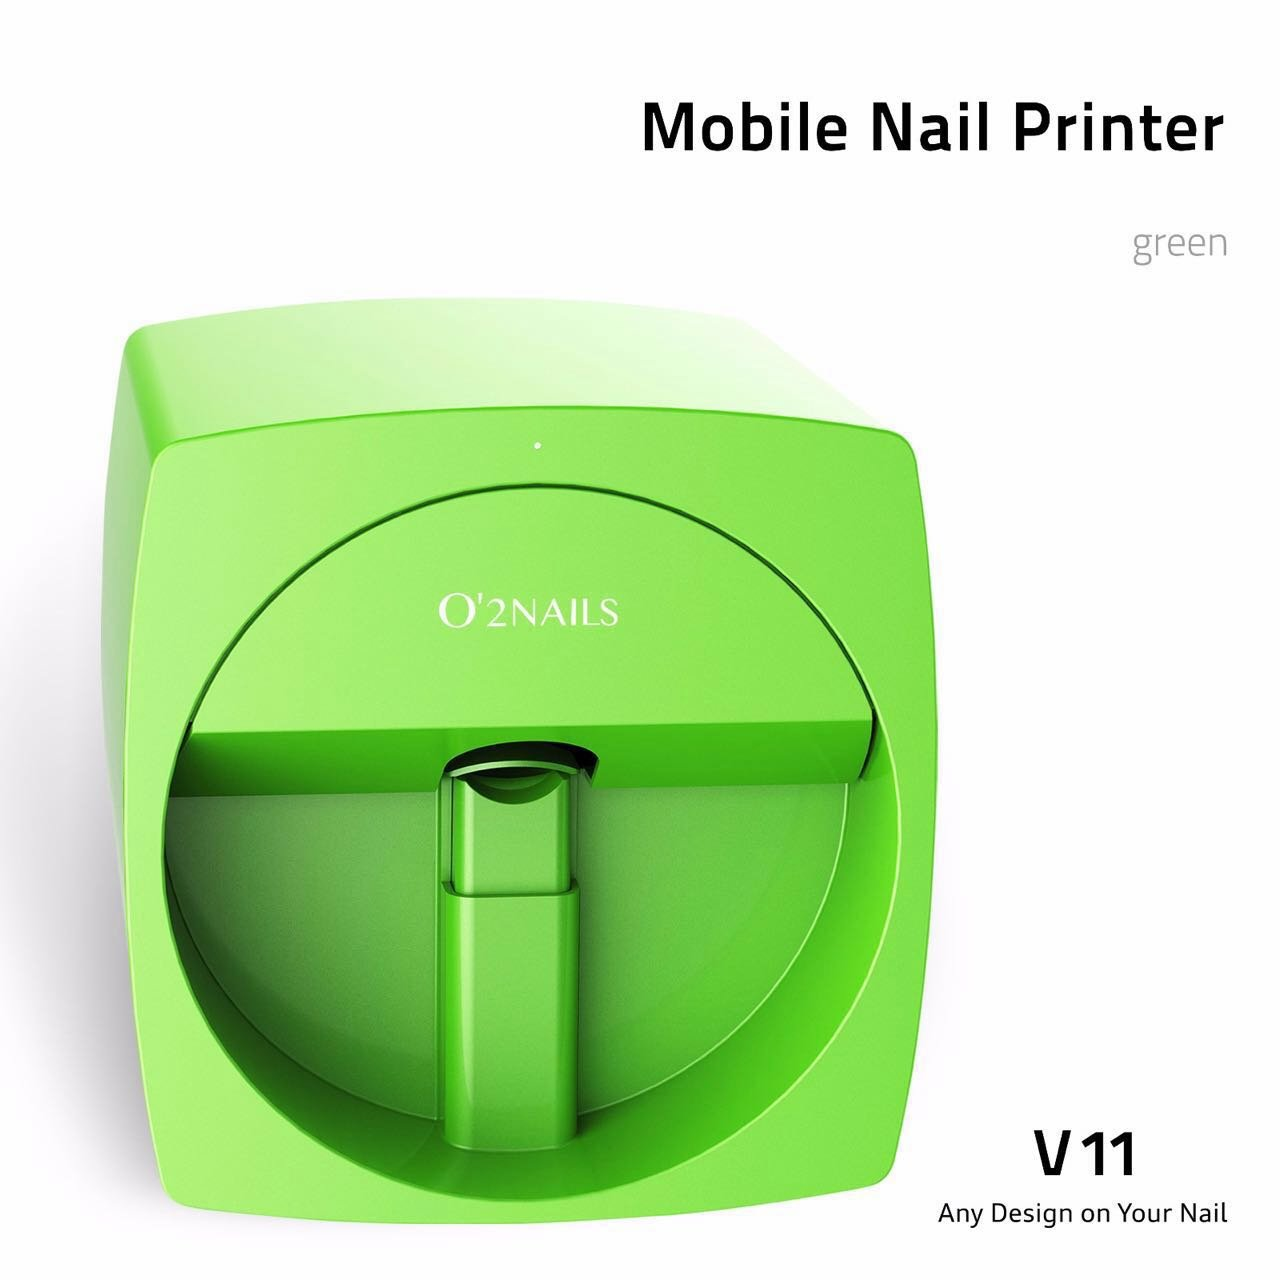 Contemporary Nail Painter Machine Model - Nail Art Ideas - morihati.com